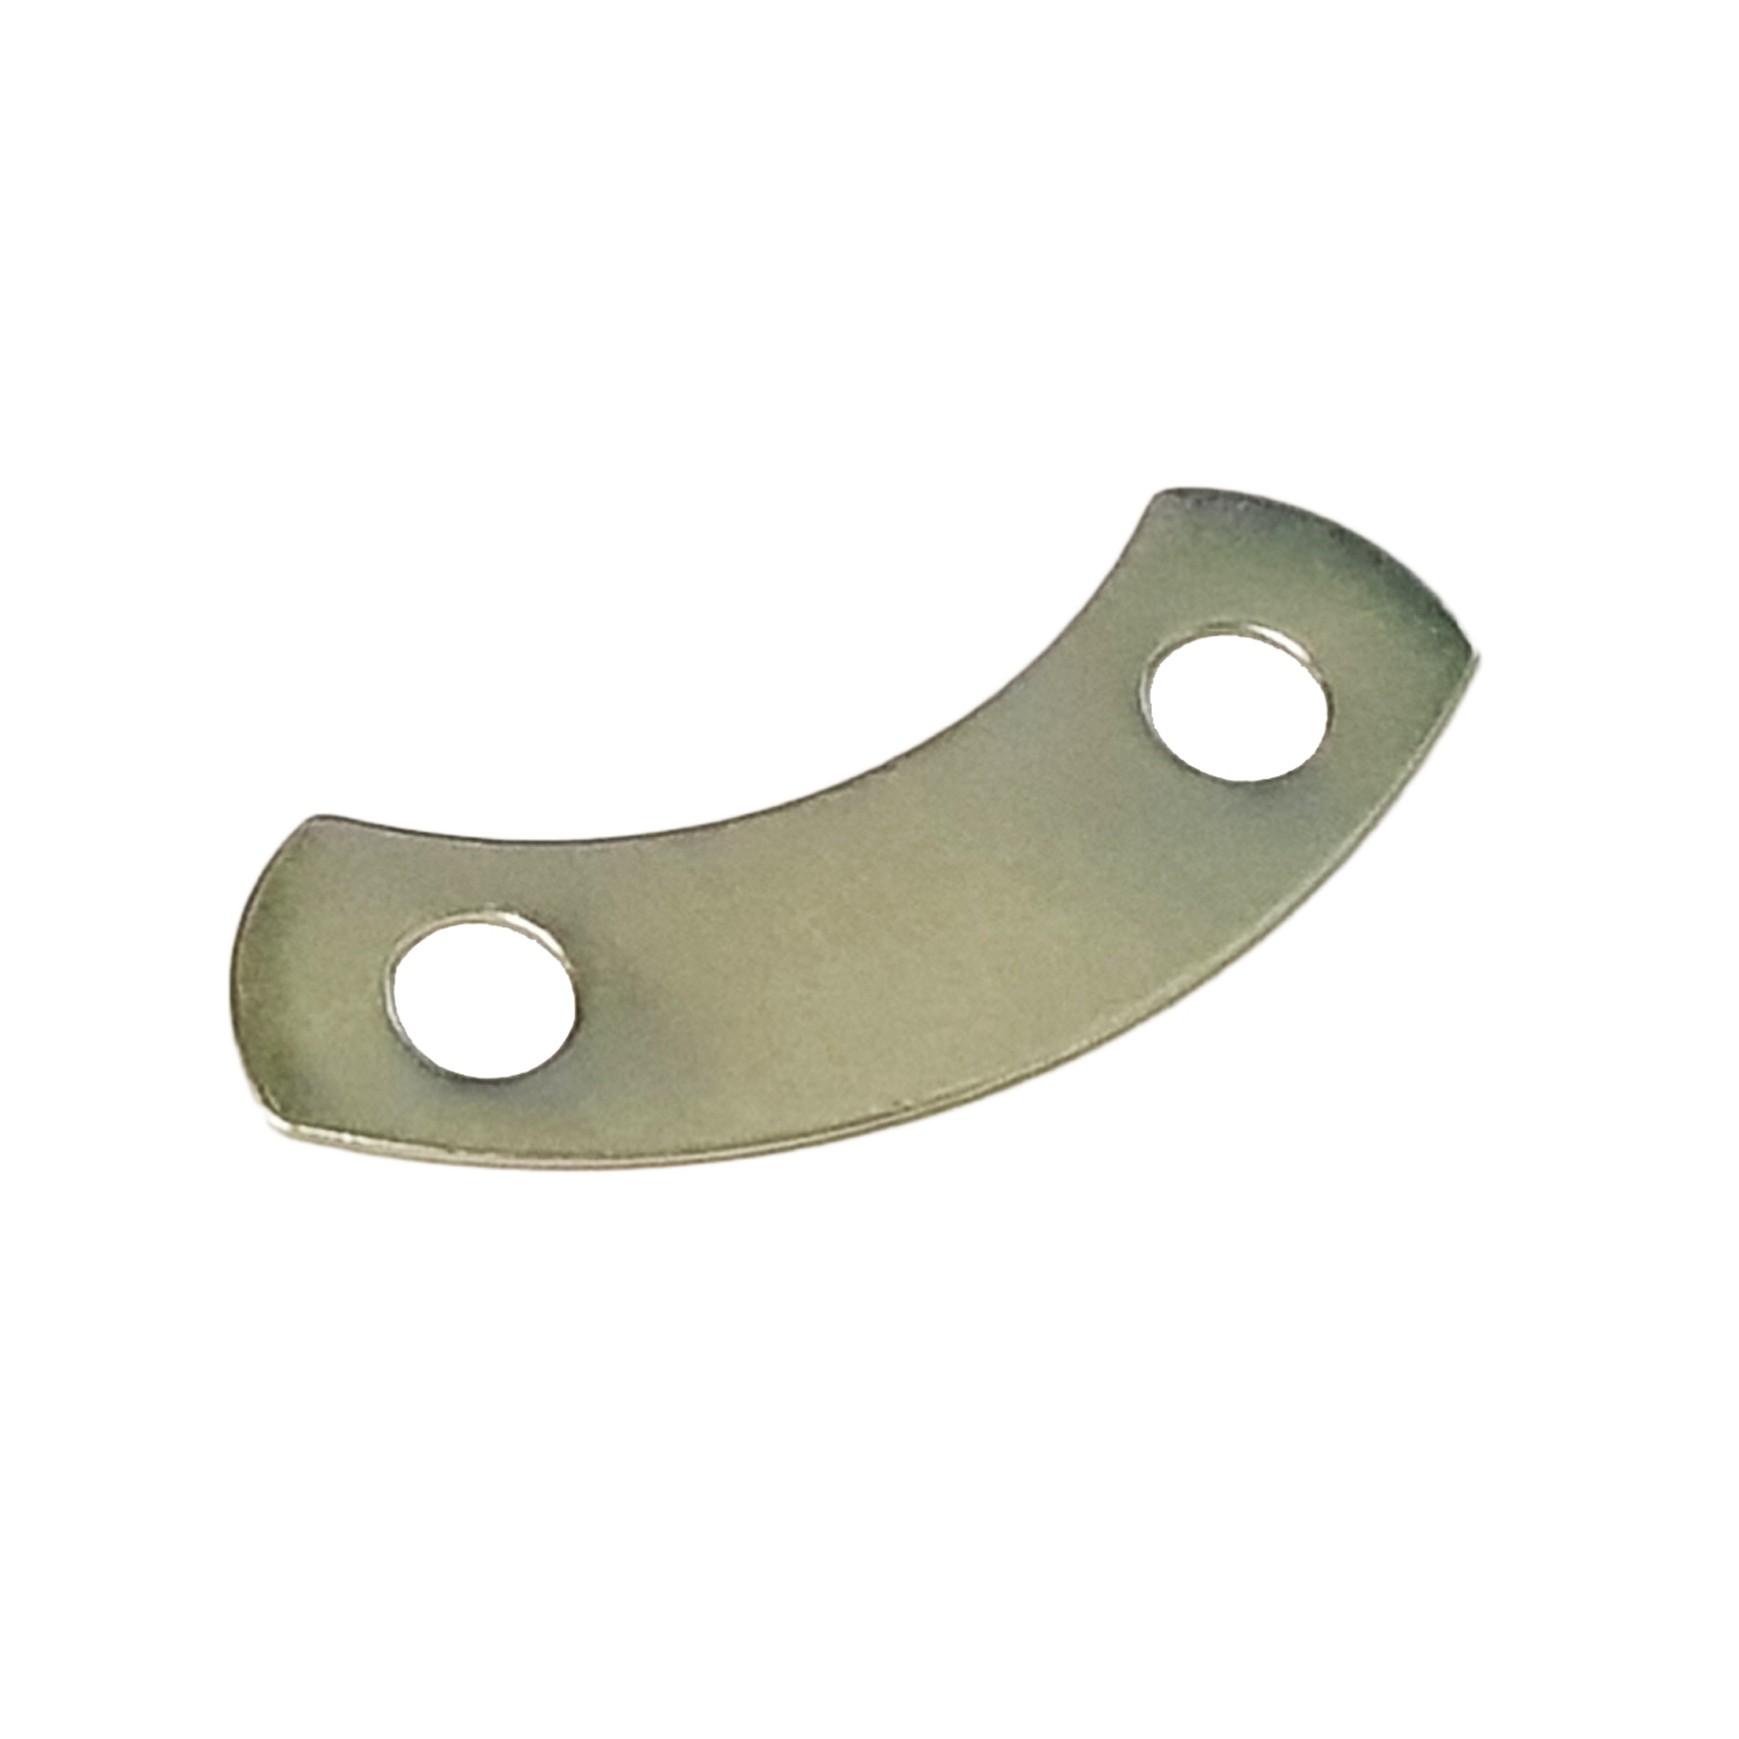 Lock Plate Propeller Shaft - W121 - 1869940325